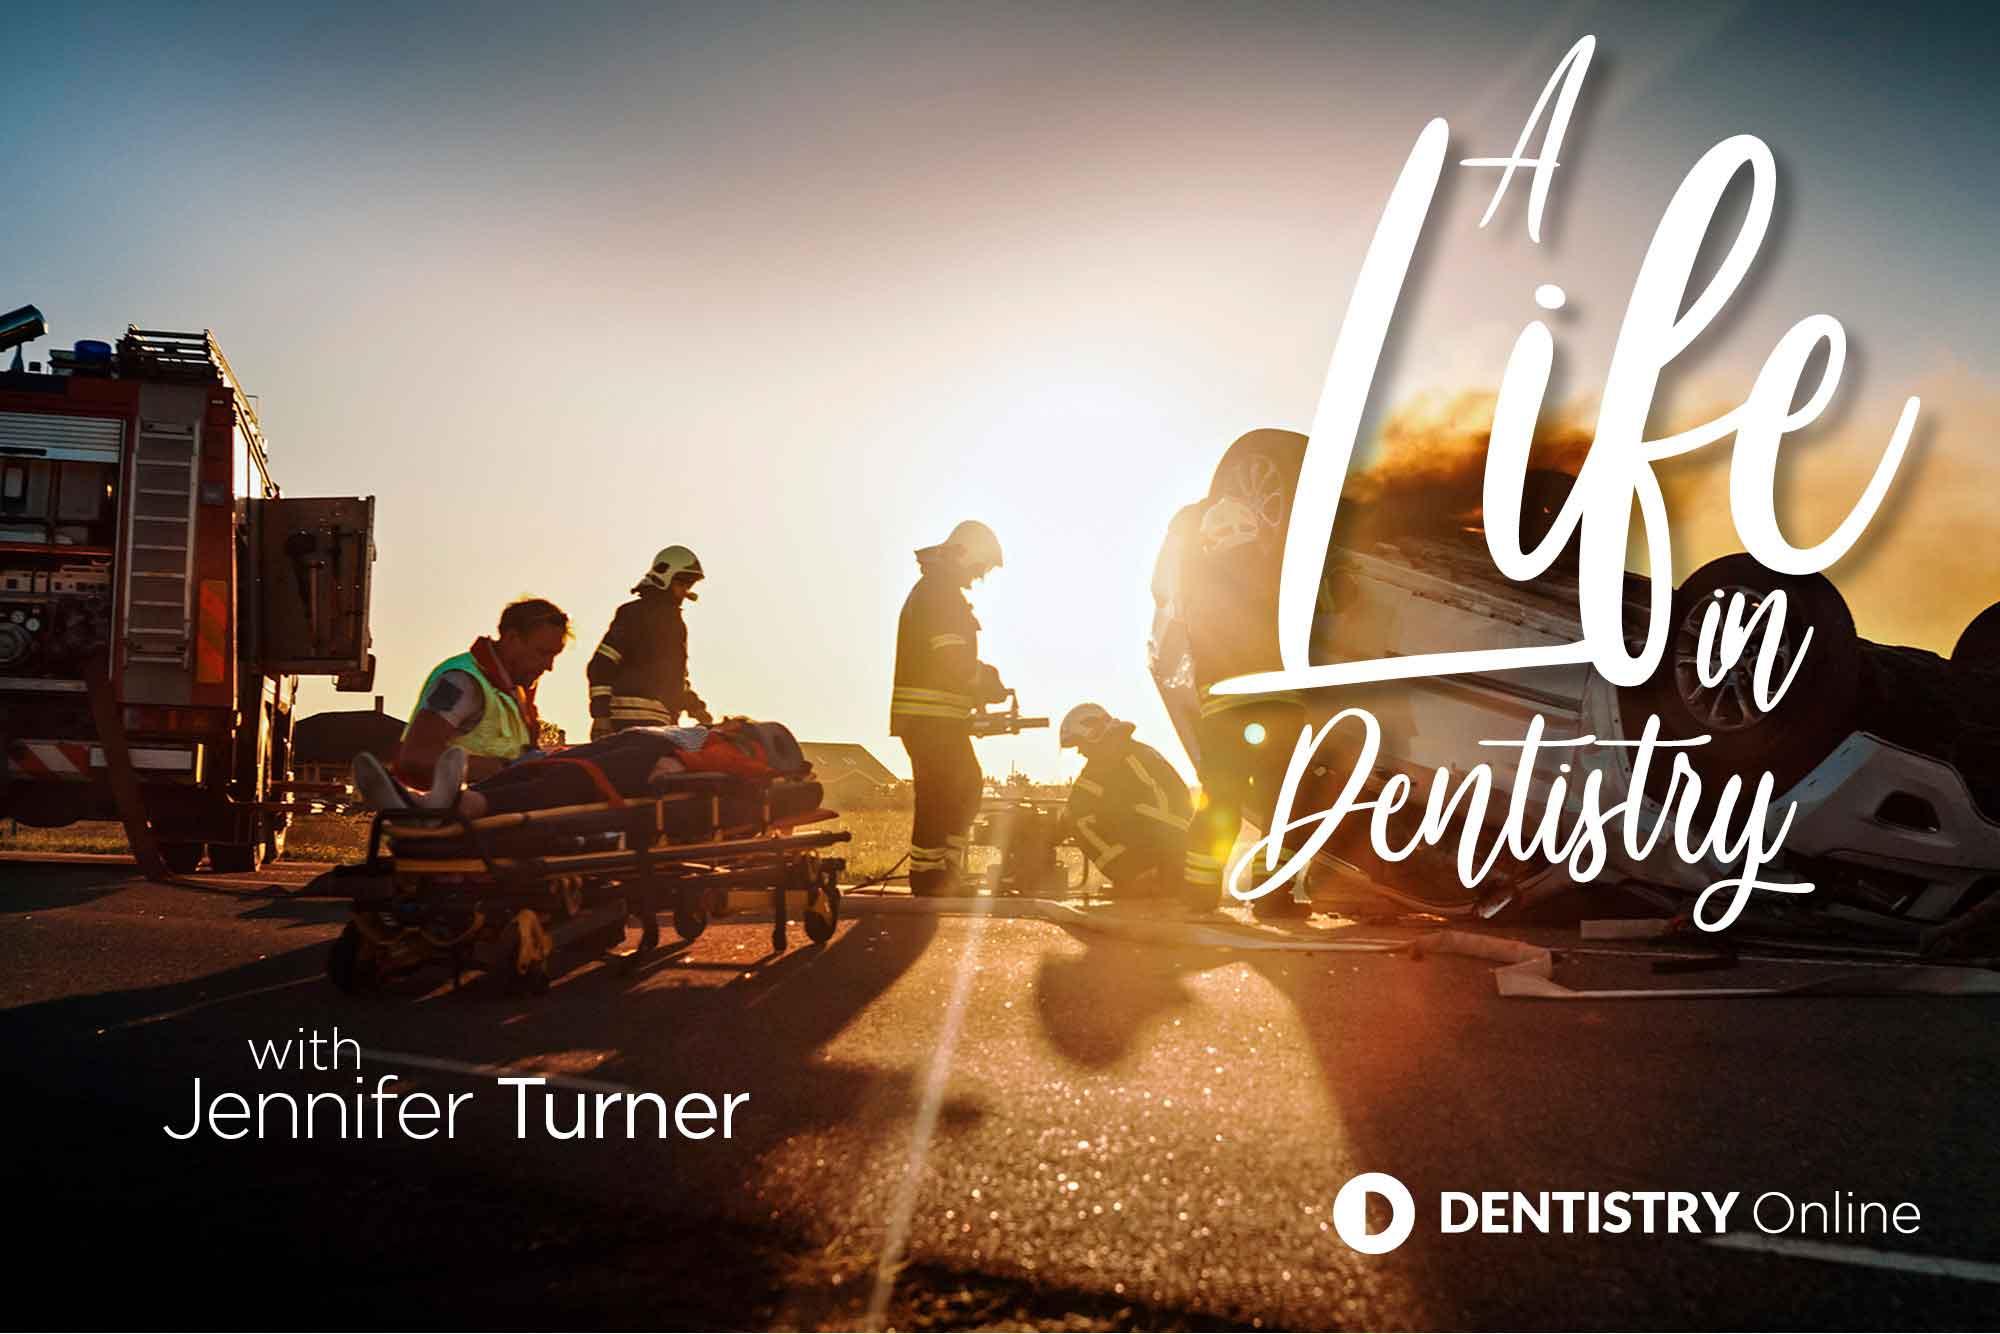 Jennifer Turner a life in dentistry